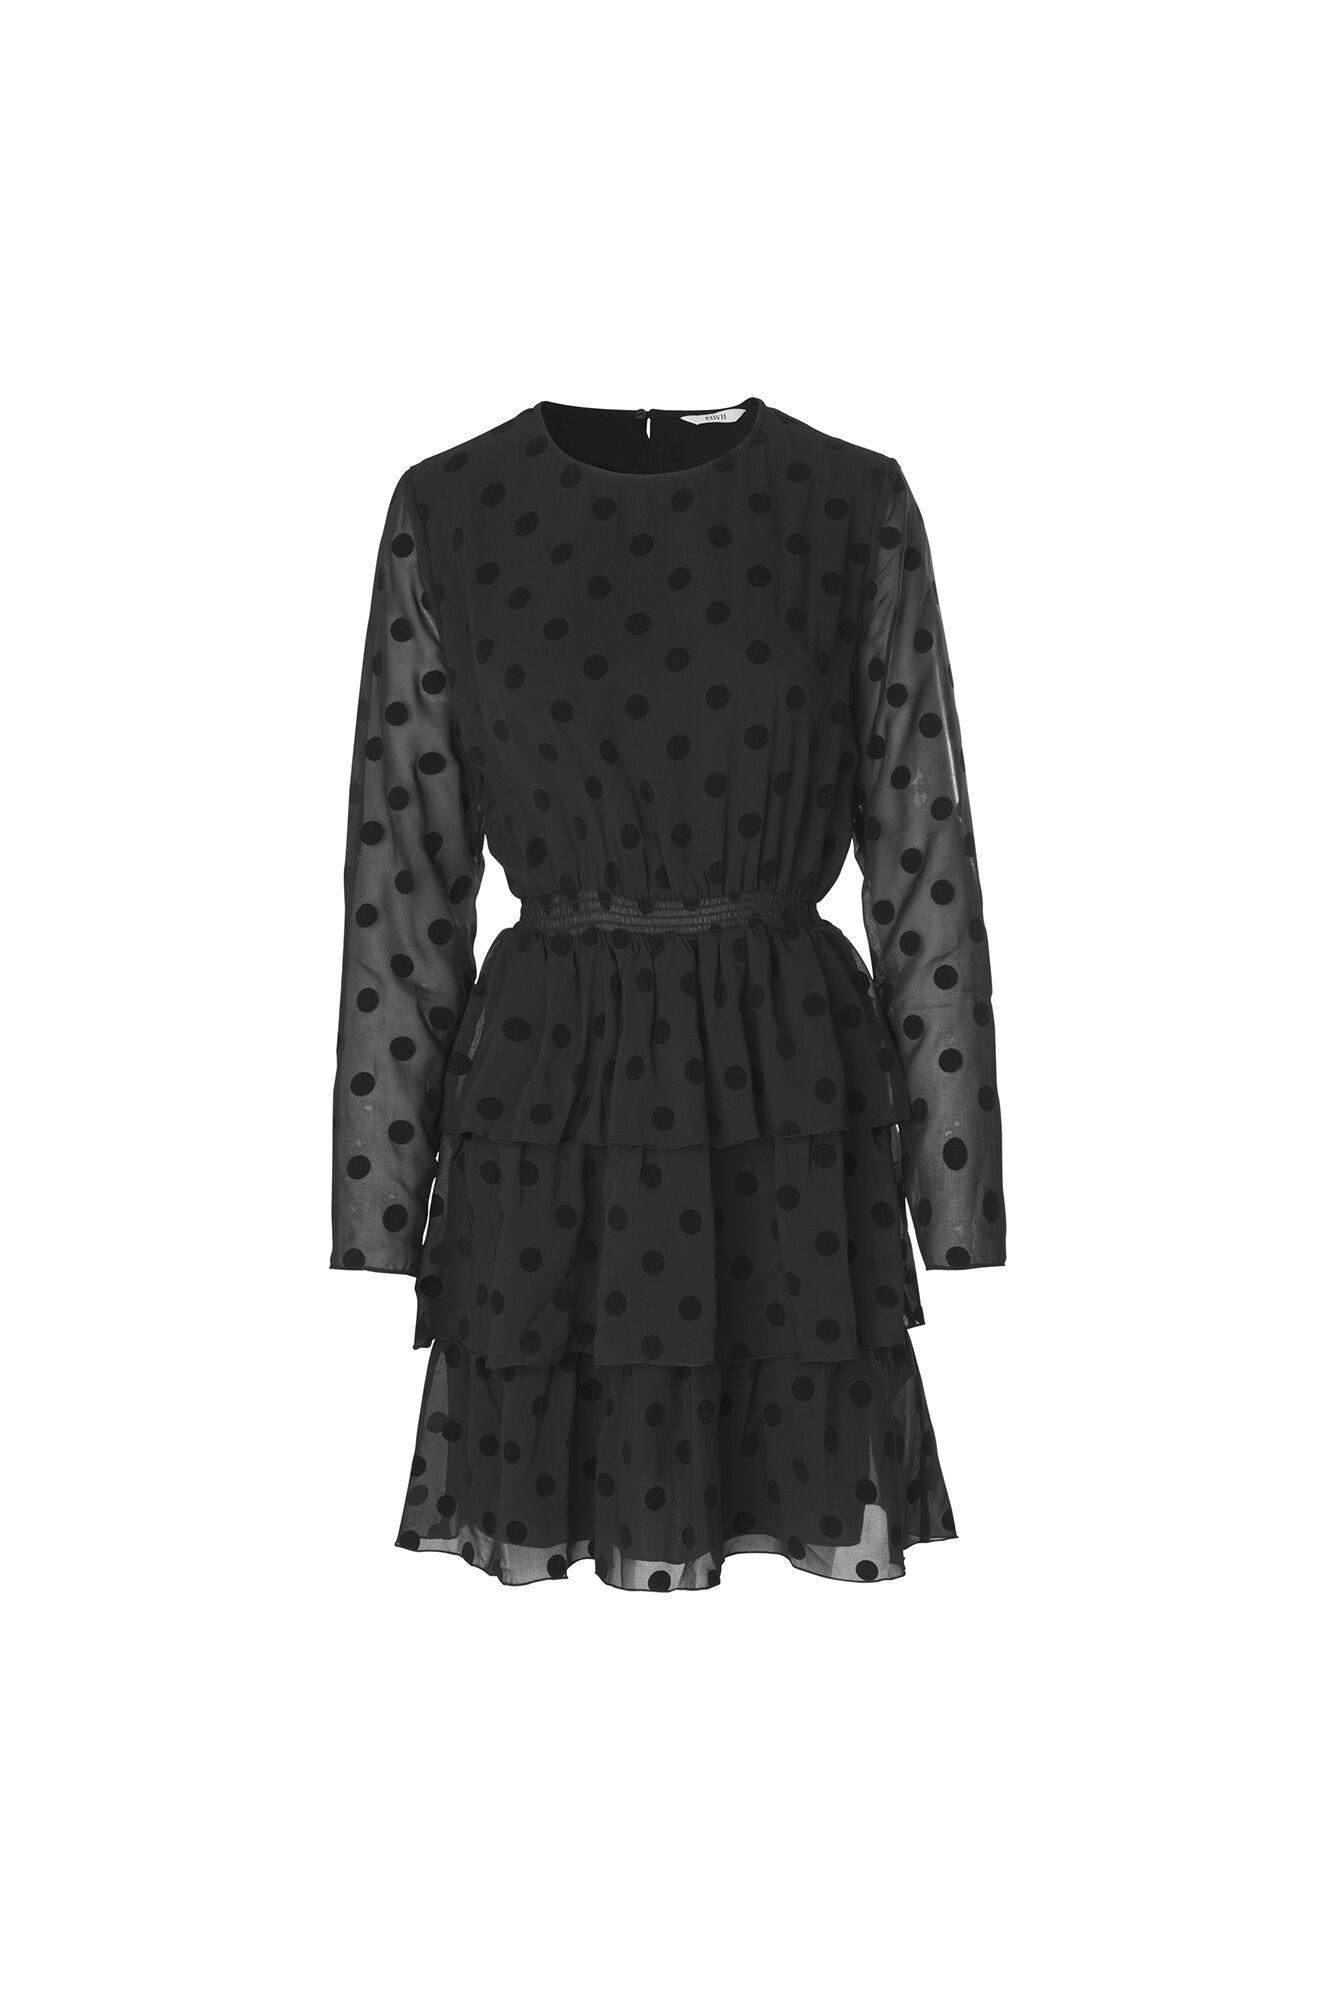 ENASPHALT LS SHORT DRESS 6553